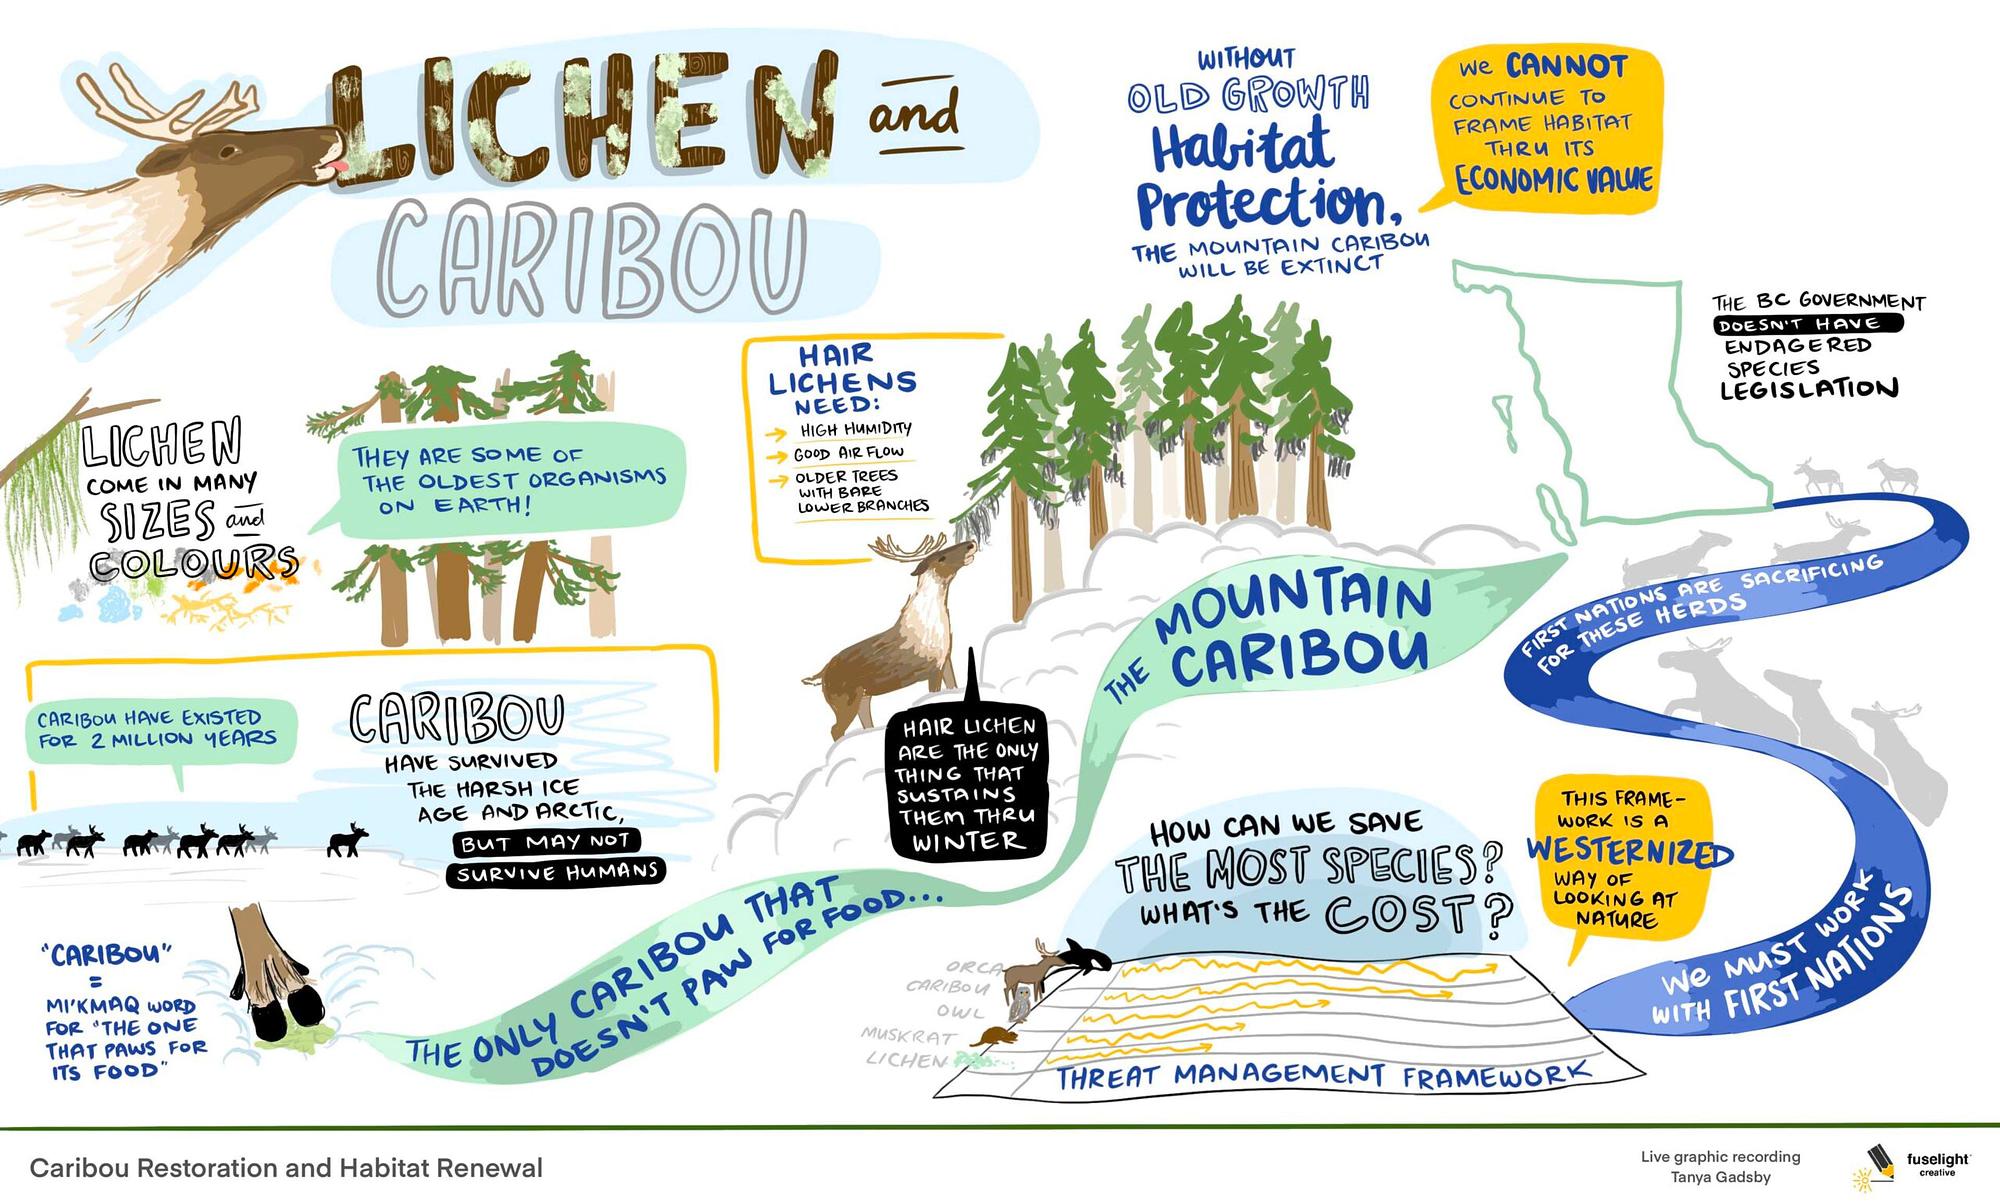 caribou habitat restoration graphic recording, live scribing, caribou graphic recording, visual summary of caribou, mountain caribou, british columbia caribou, lichen and caribou, graphic facilitation